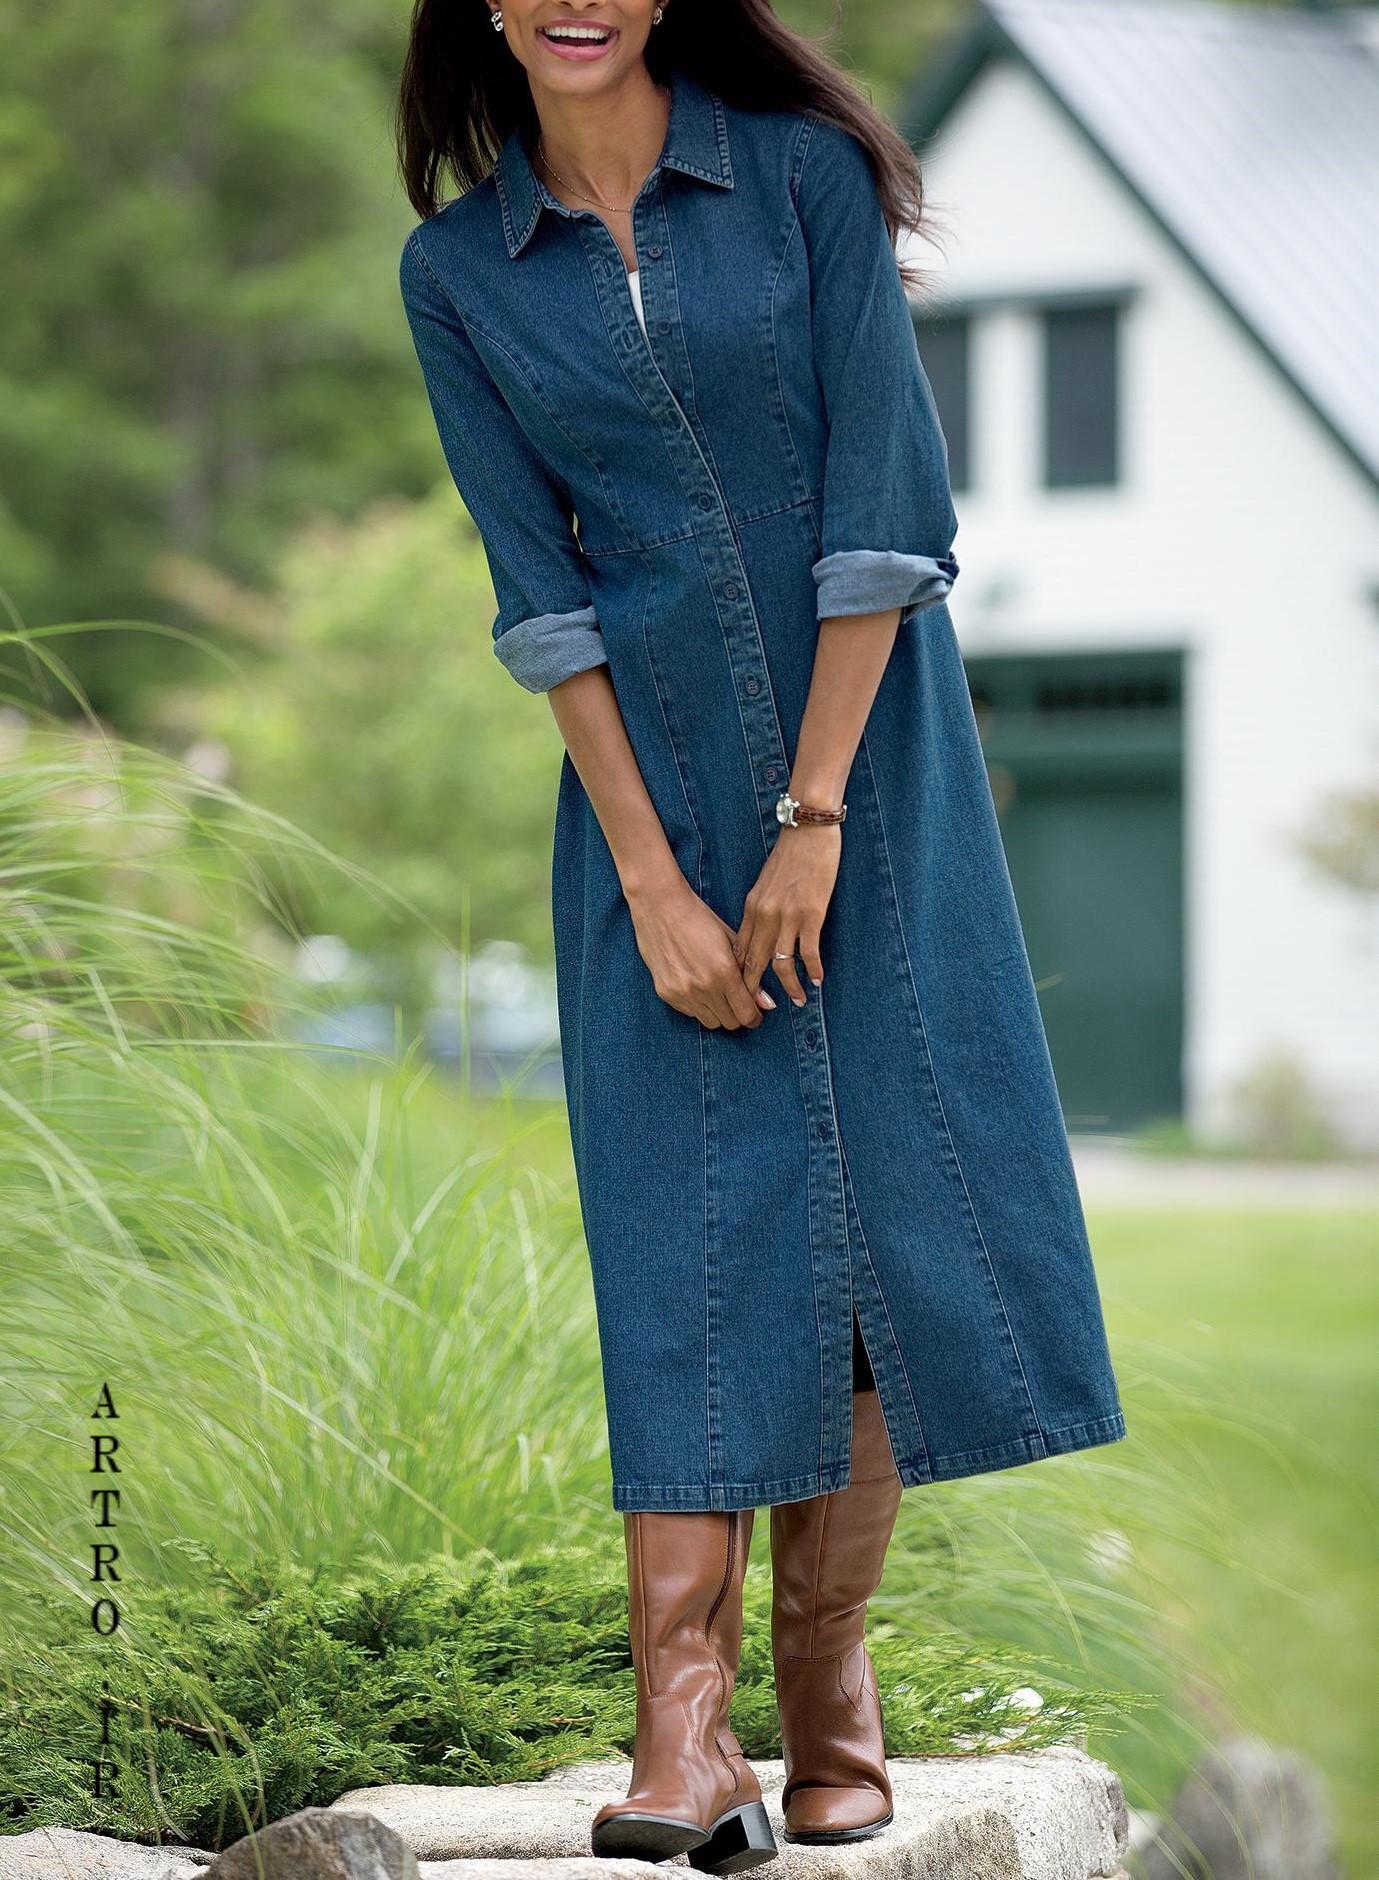 مدل مانتو جین شیک